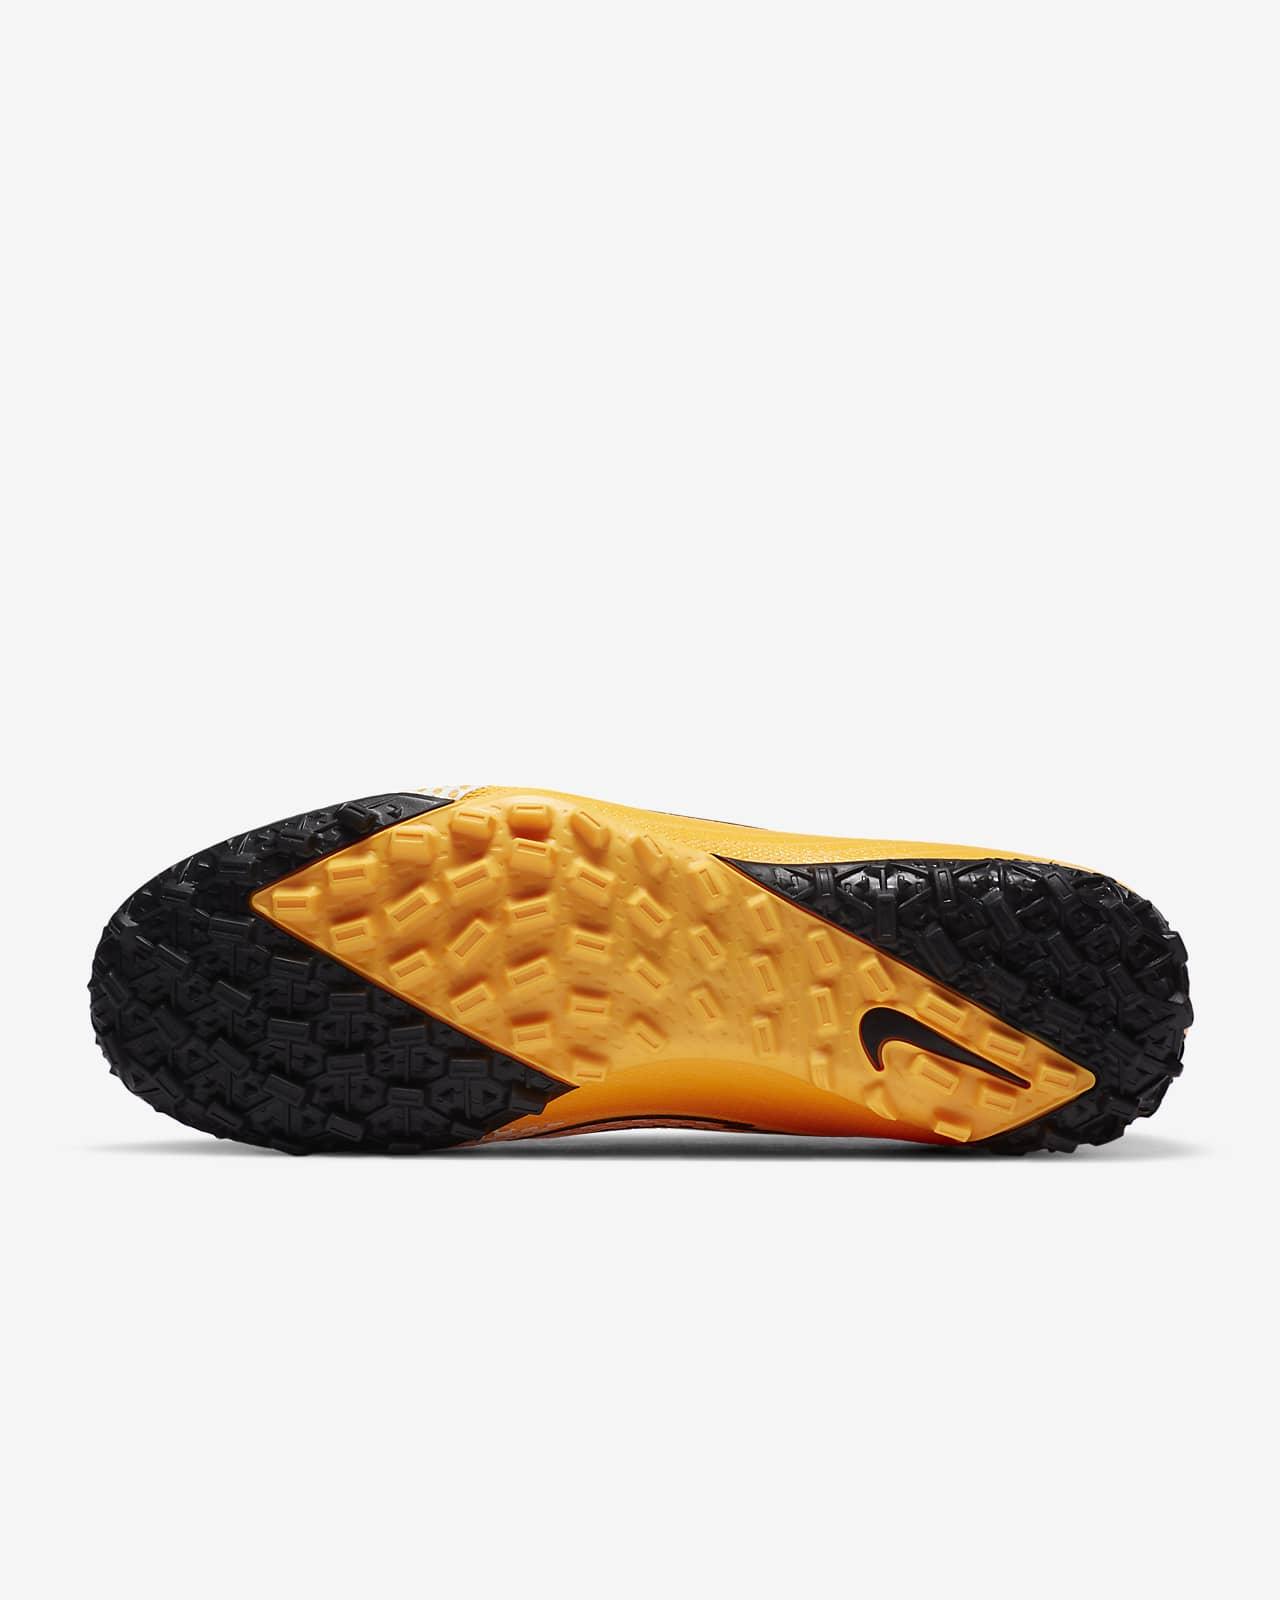 Giày cỏ nhân tạo Nike Nike Mercurial Vapor 13 Pro TF Daybreak